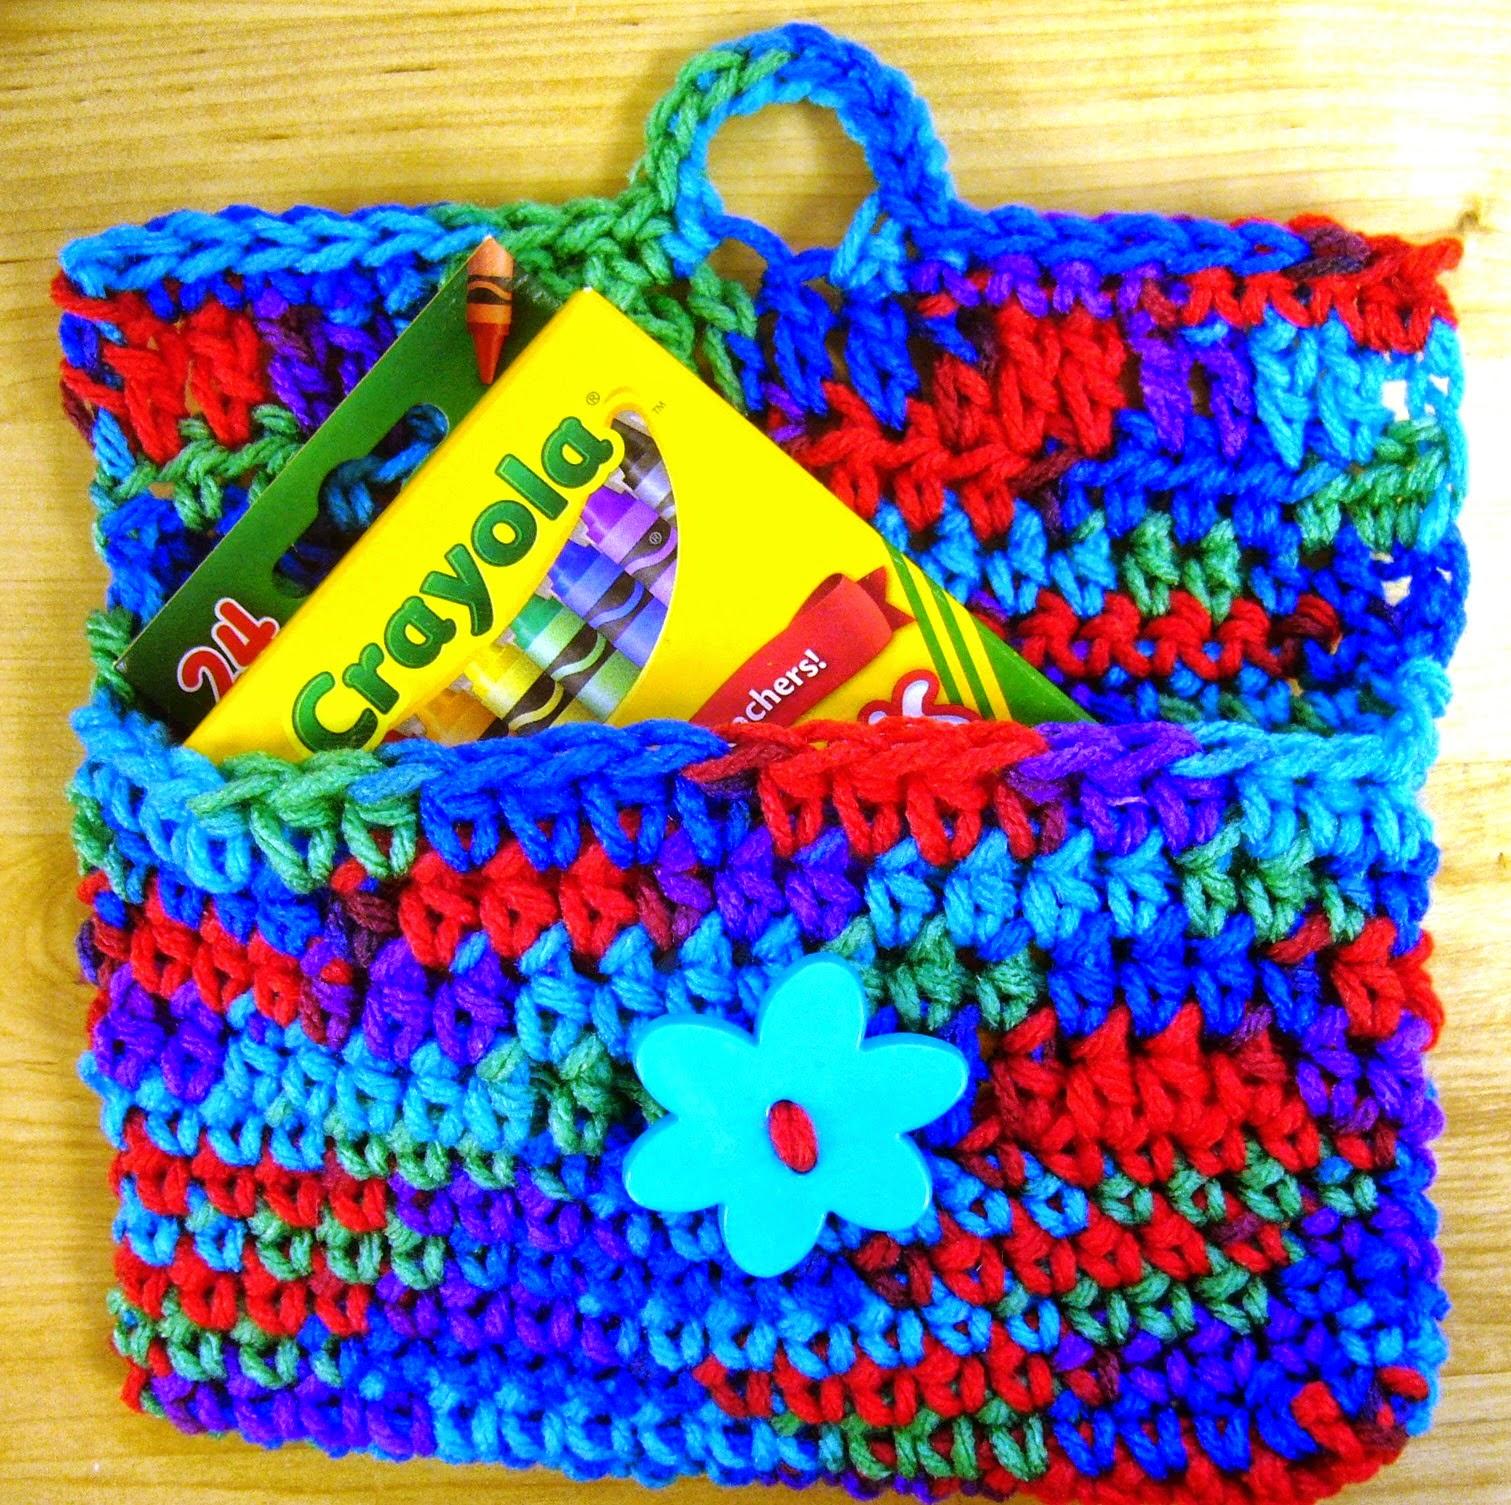 http://www.simplyshoeboxes.com/2015/03/mini-purse-or-wallet-crochet.html